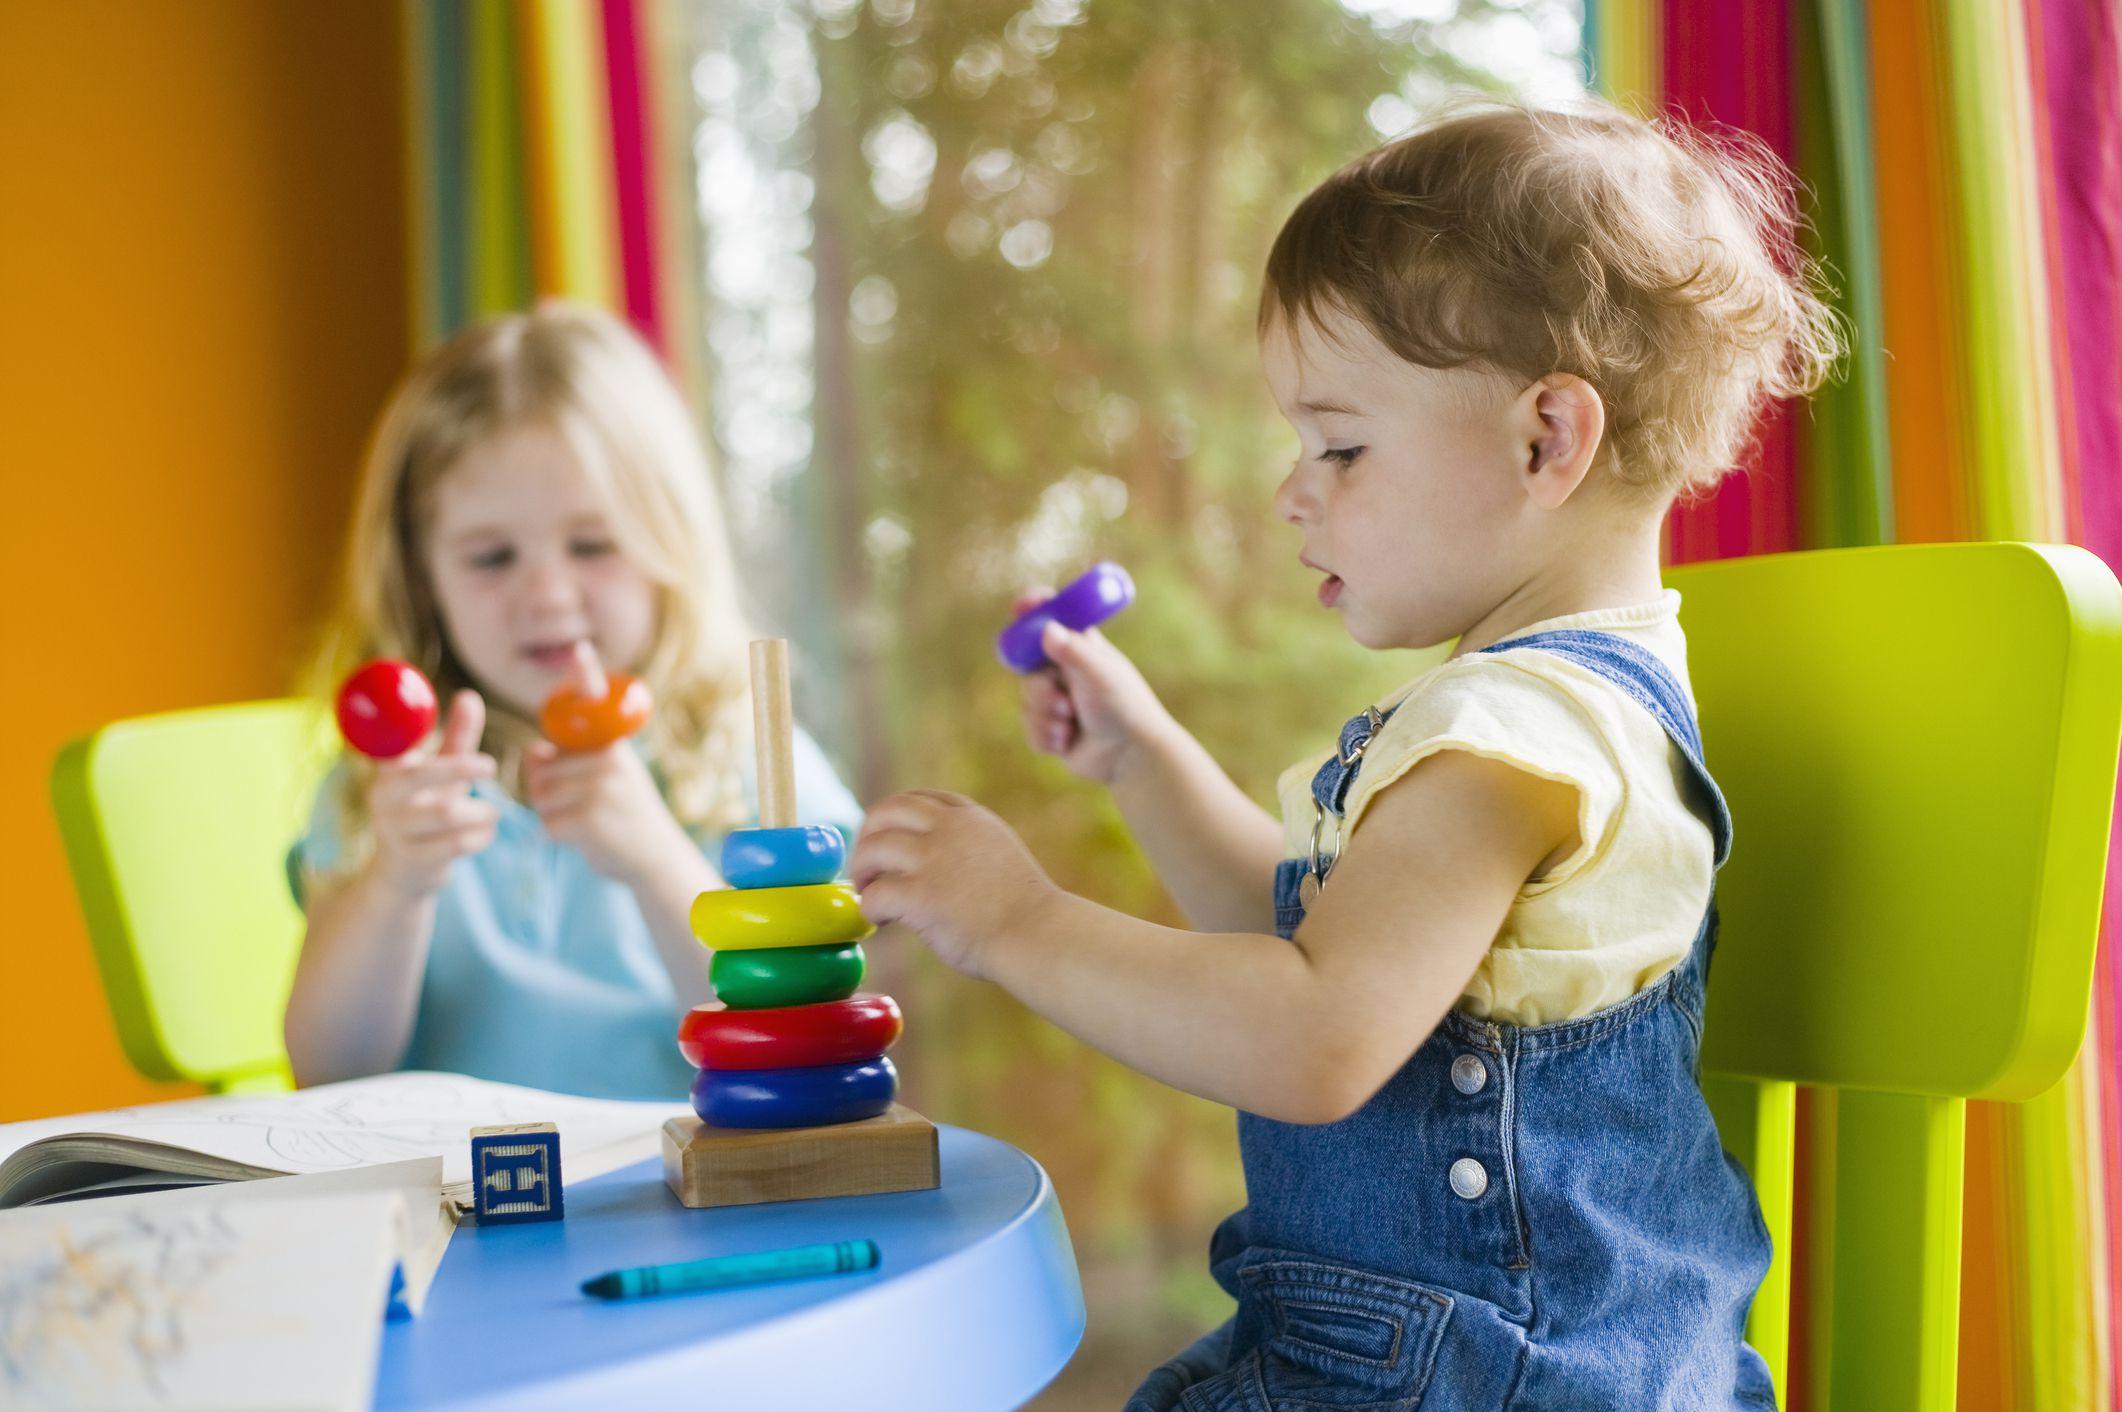 Children Should Avoid Bringing Certain Items to School